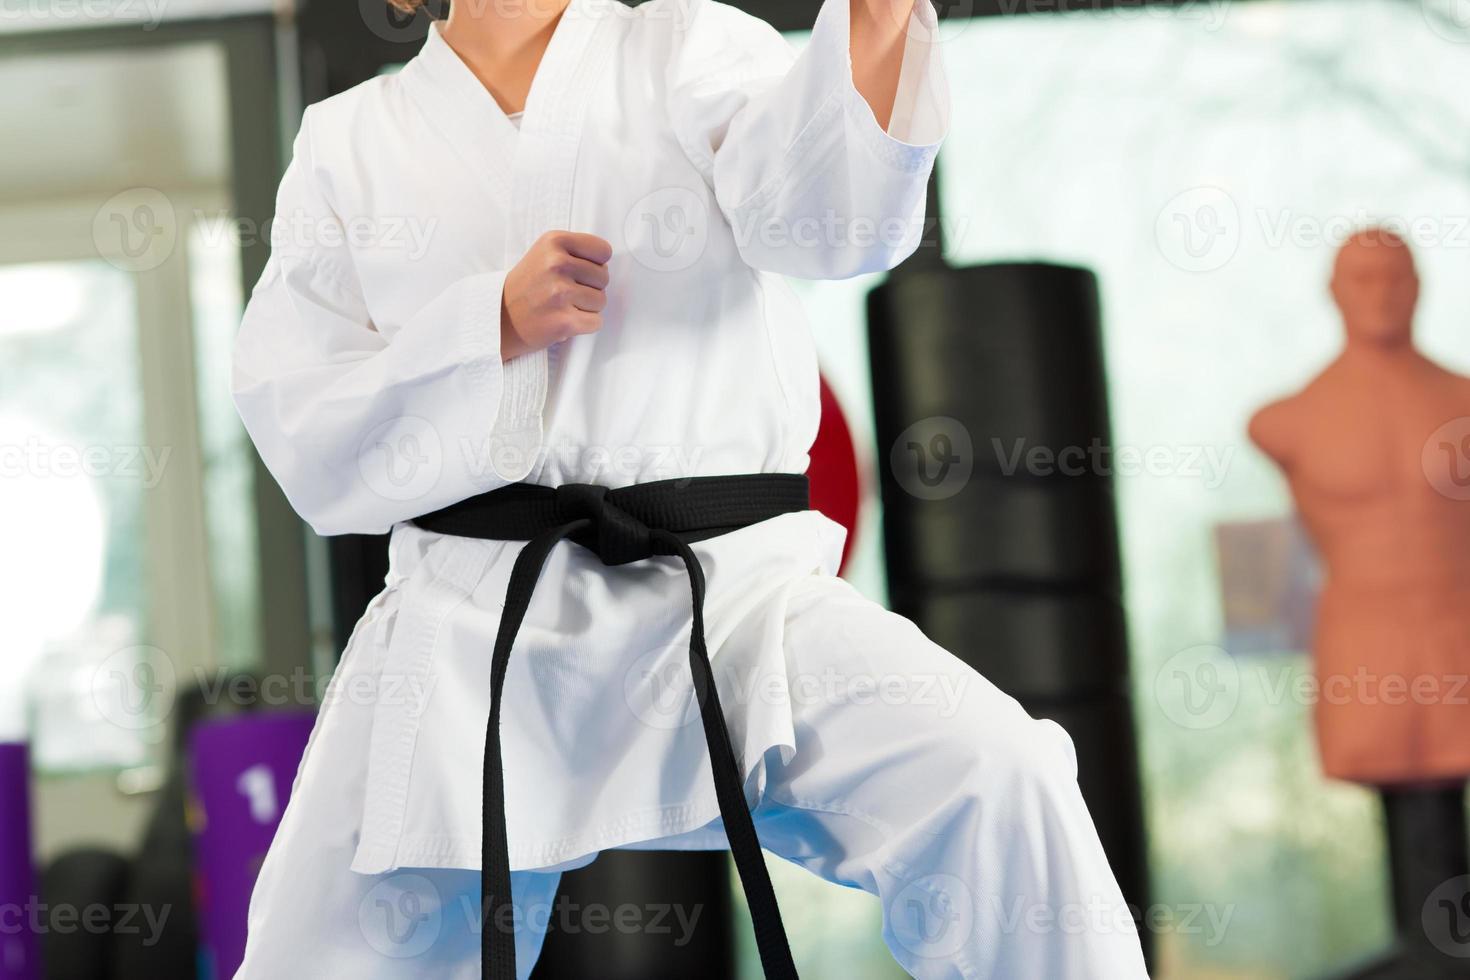 vechtsporten sporttraining in de sportschool foto